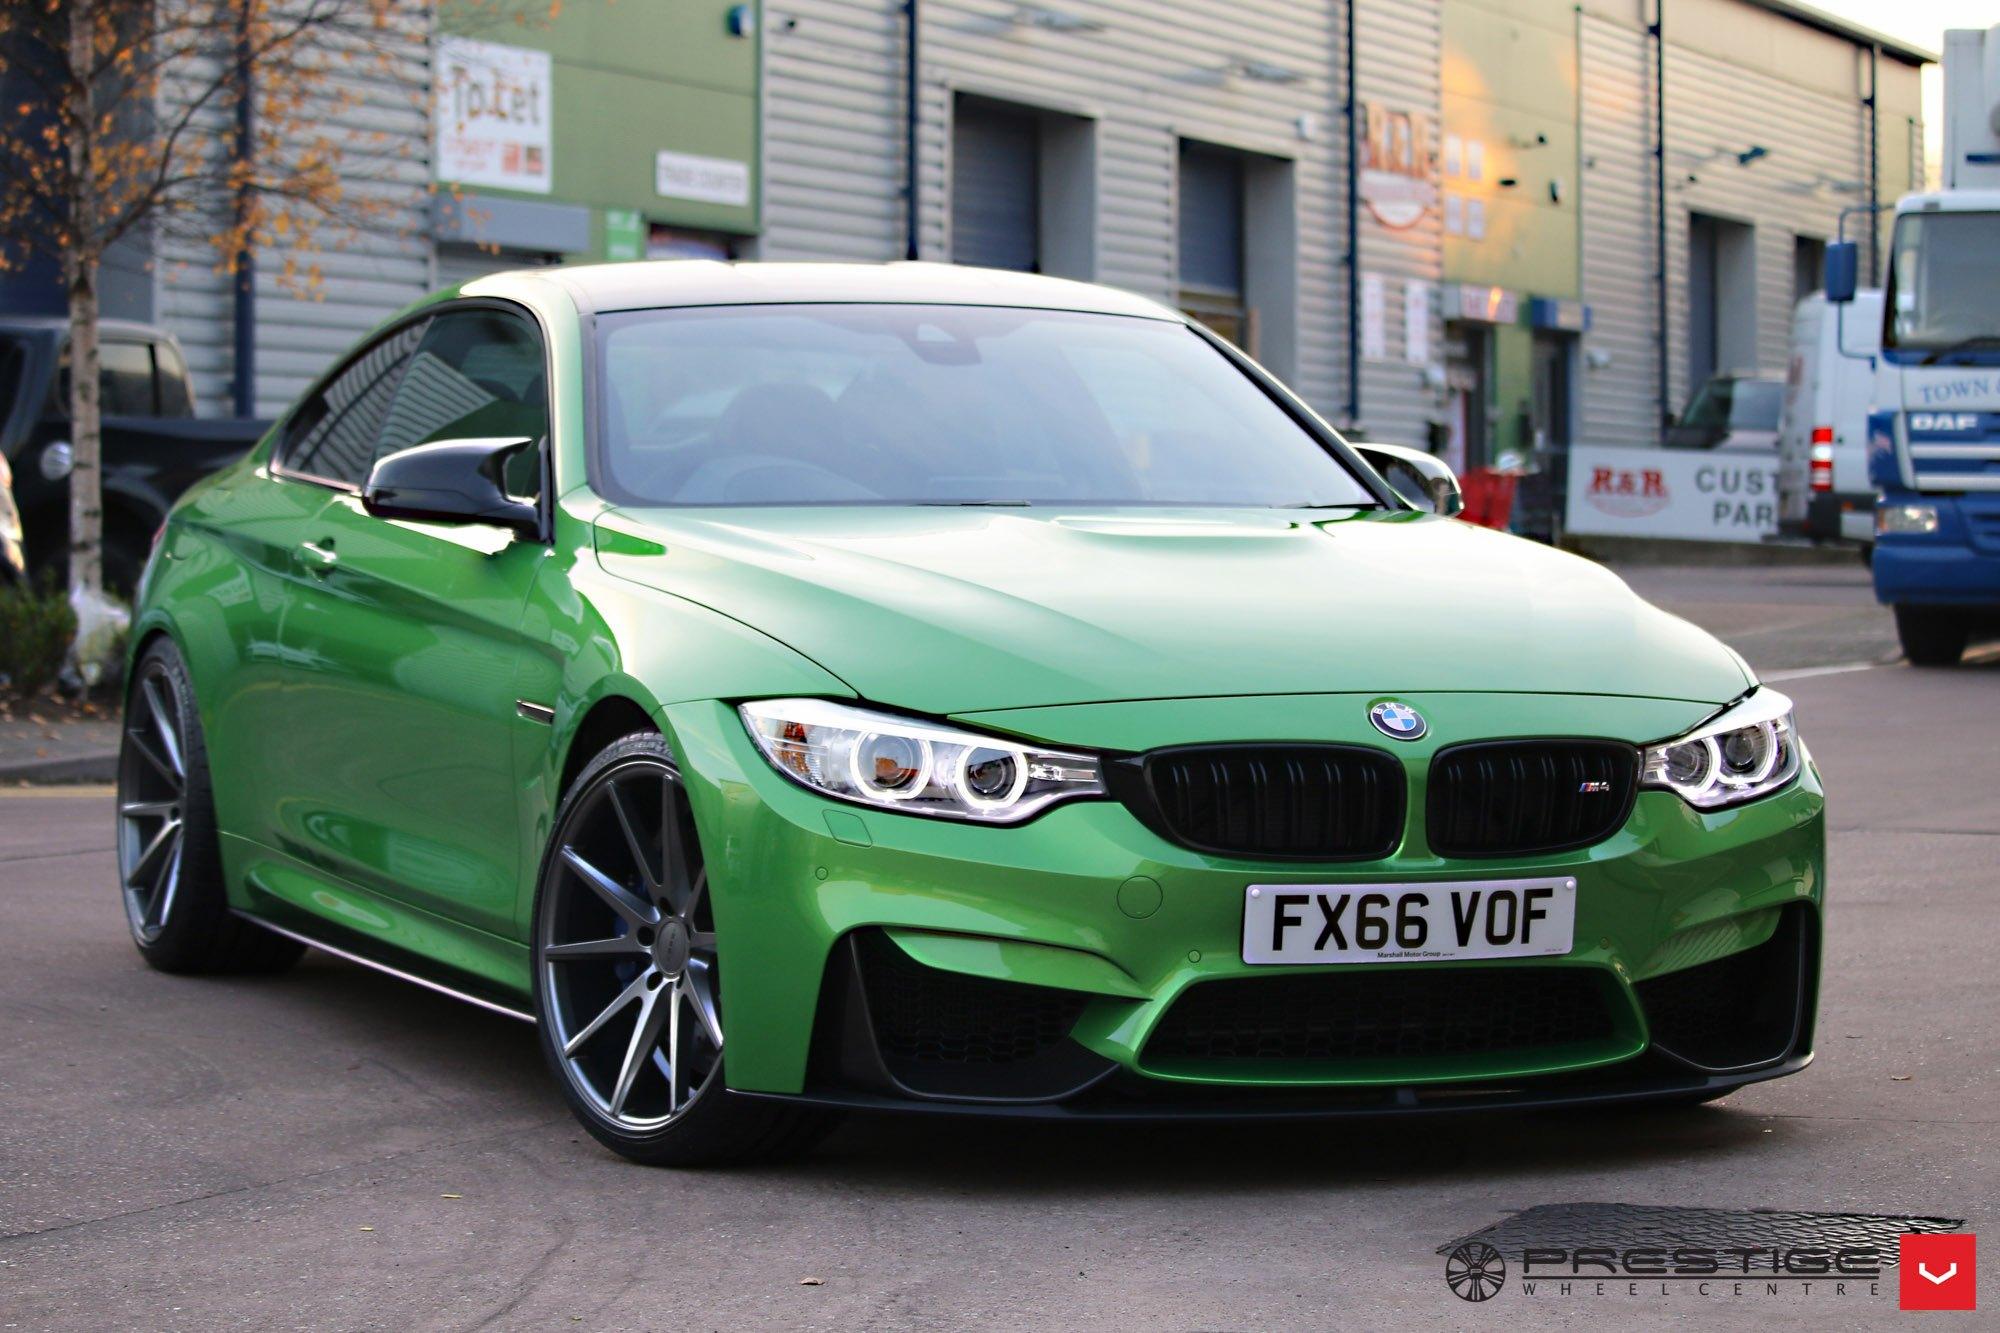 Enriched Custom Green BMW Series To Please The Eye CARiDcom - Bmw 4 by 4